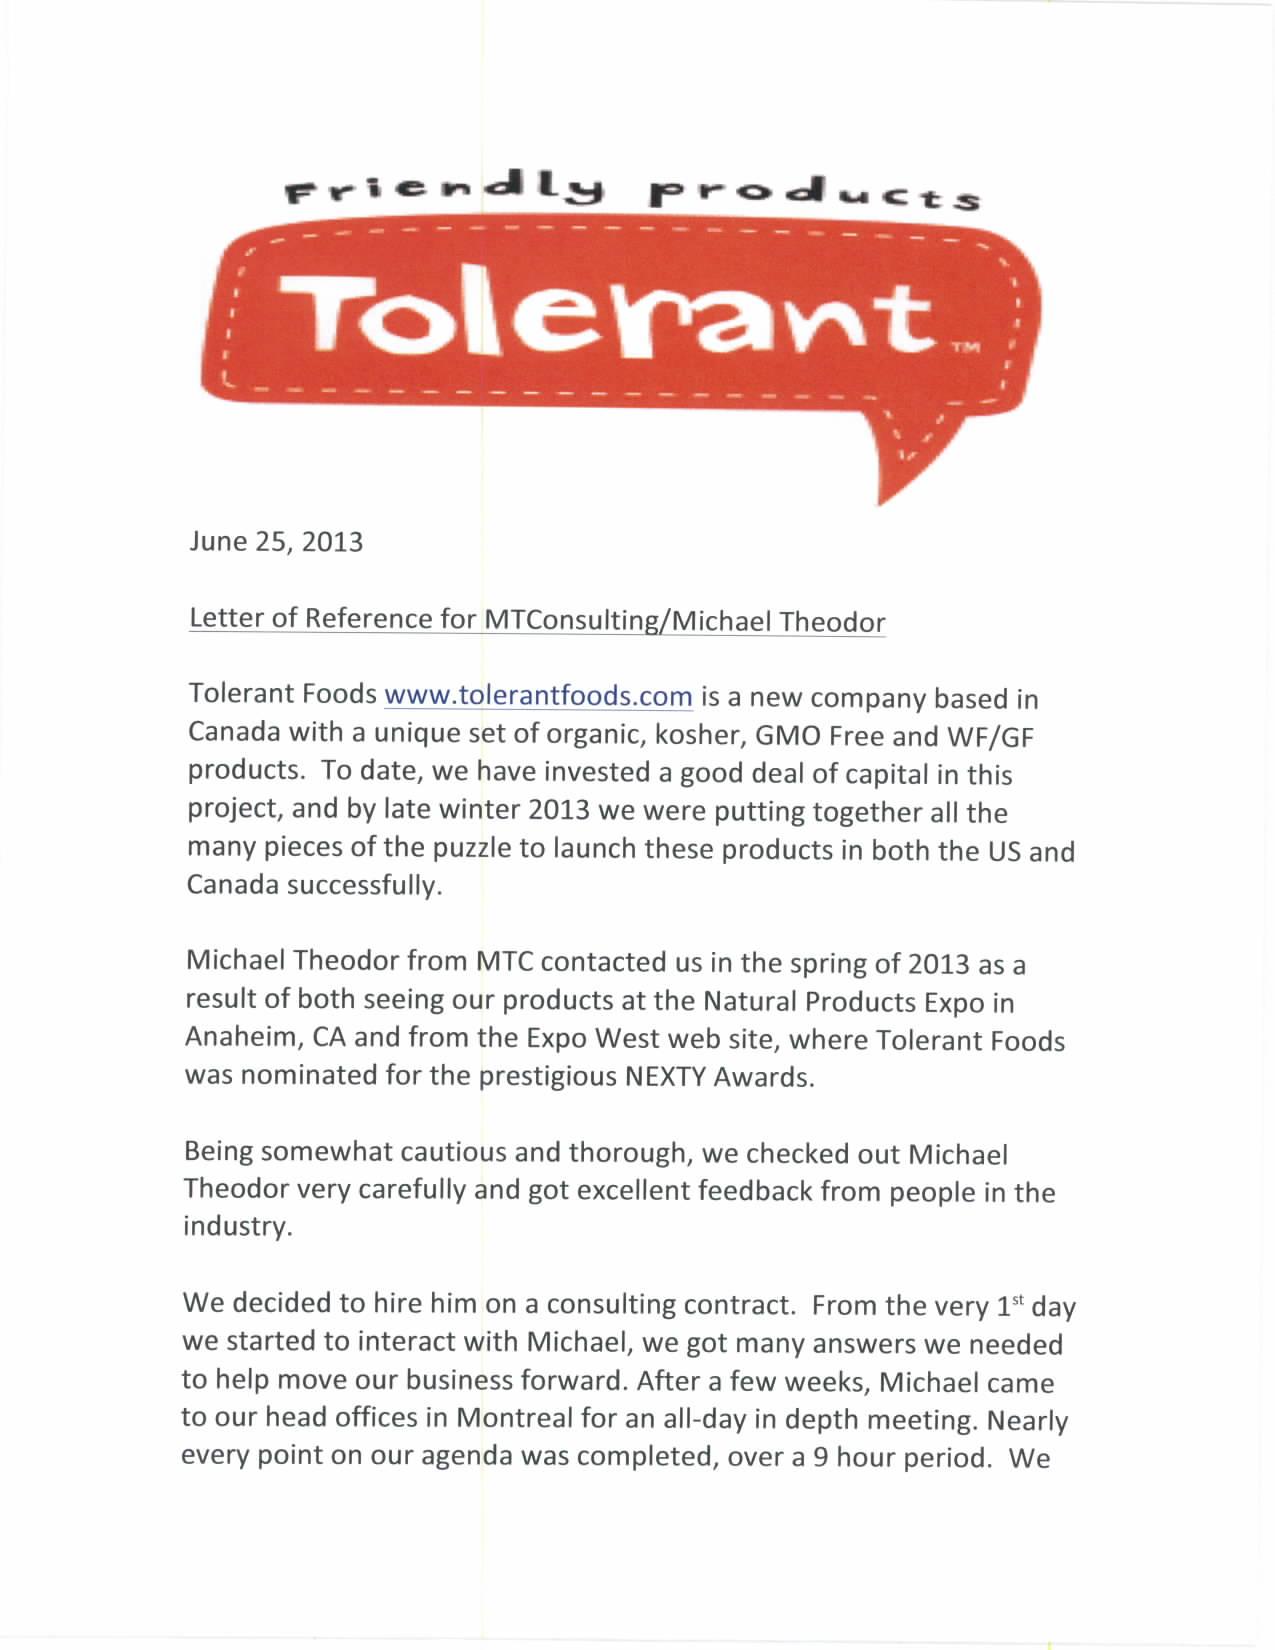 tolerant1pro